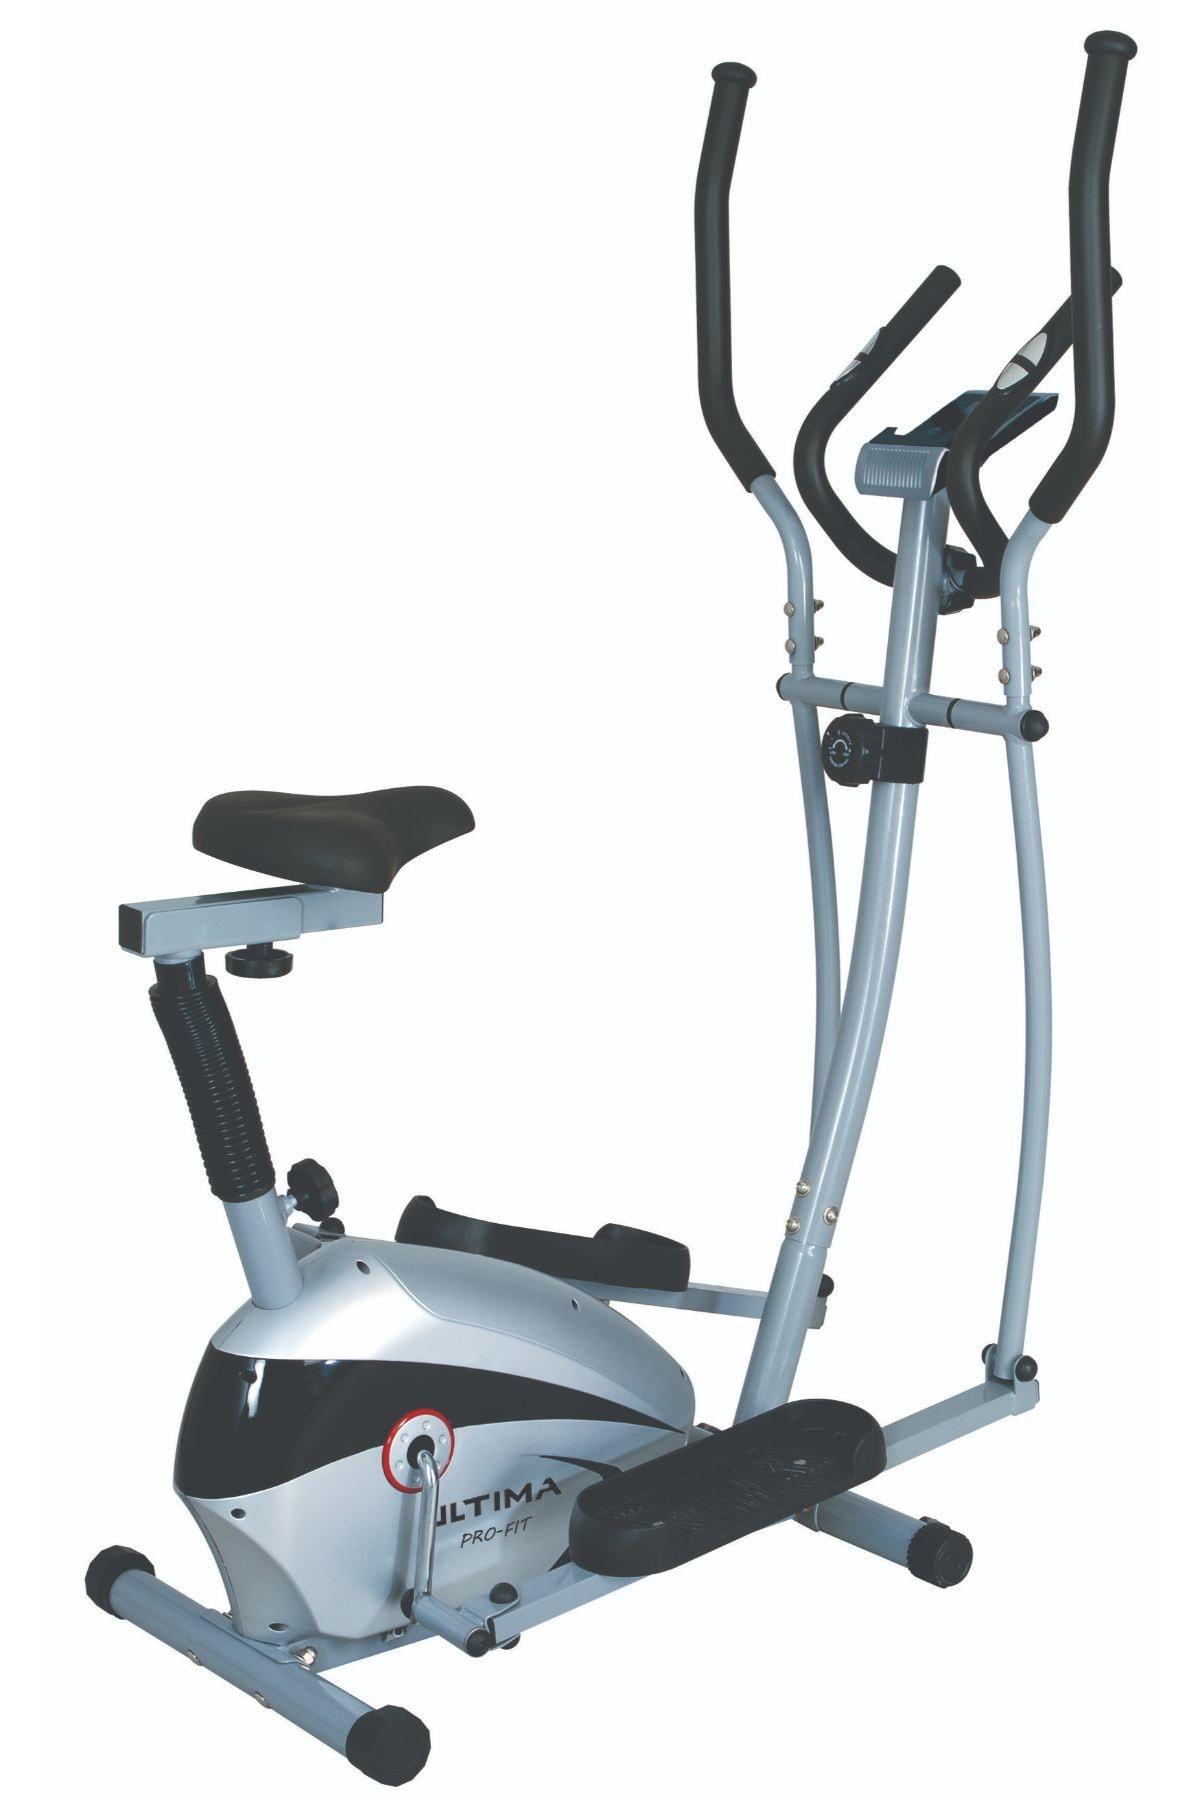 ULTIMA Pro-Fit Manyetik Eliptik Kondisyon Bisikleti 1